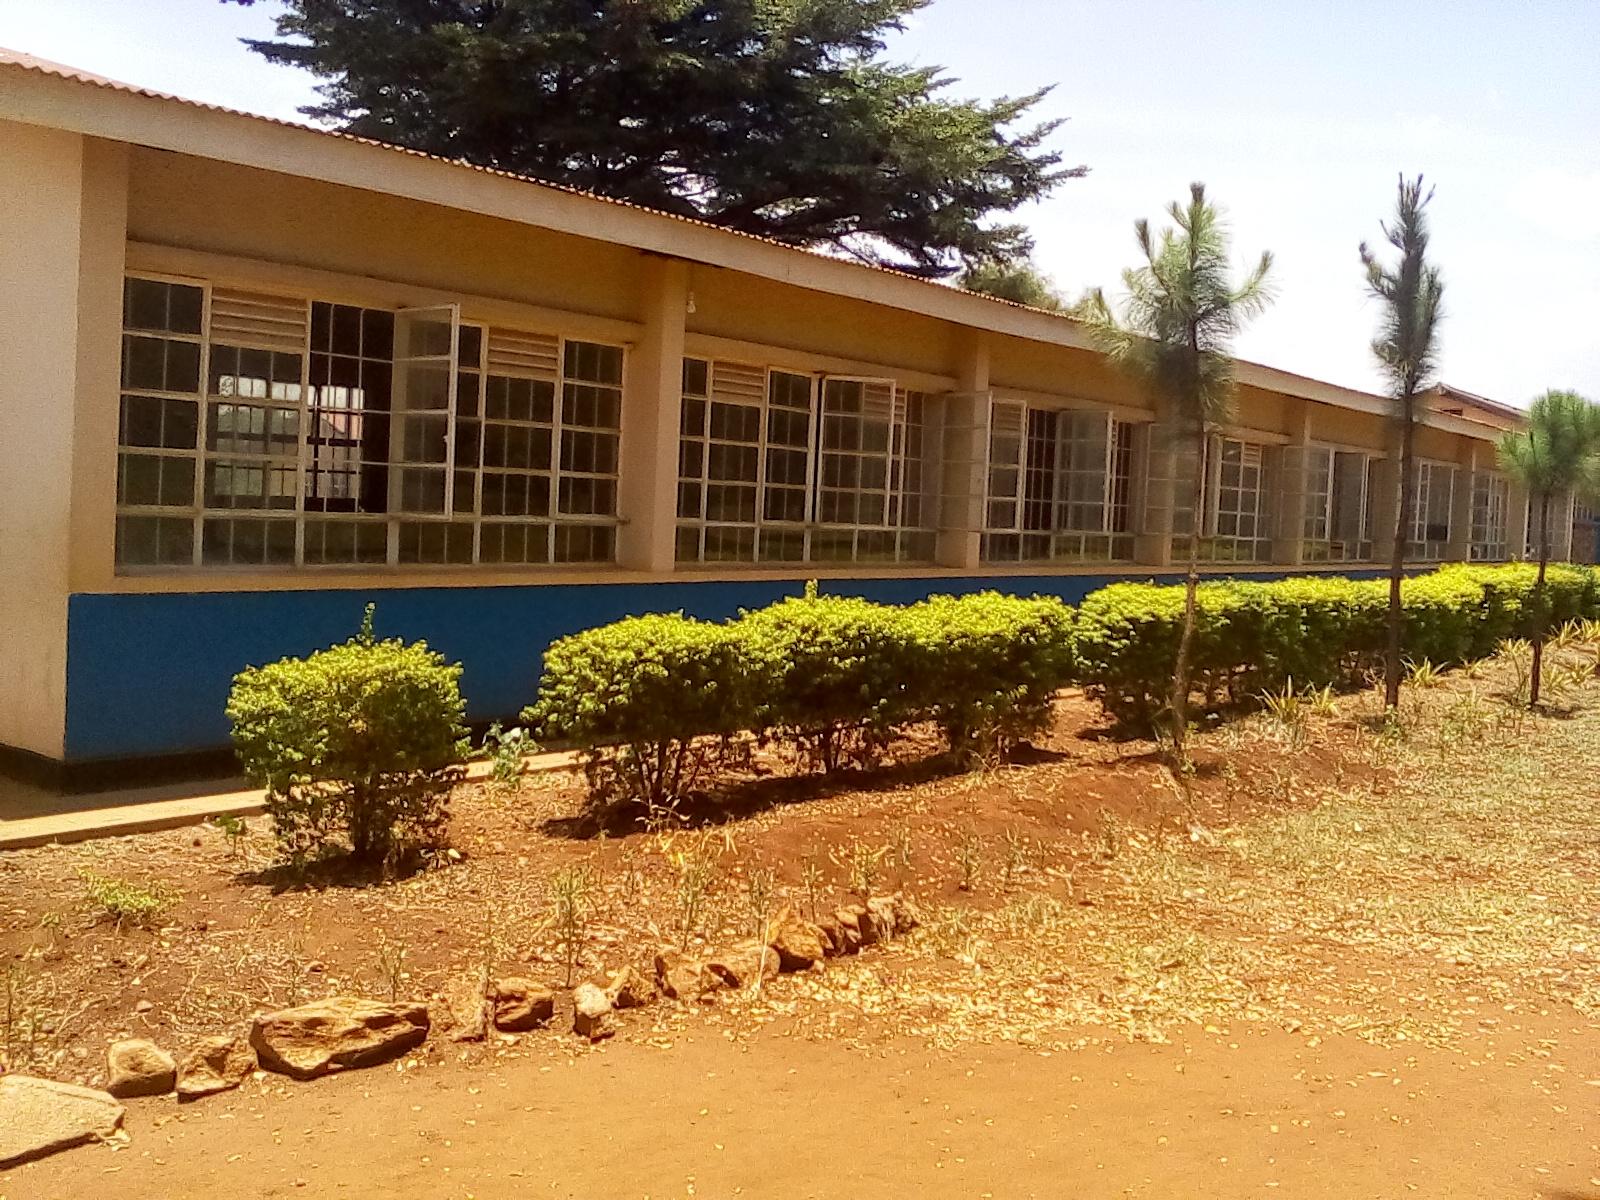 Example of a classroom block